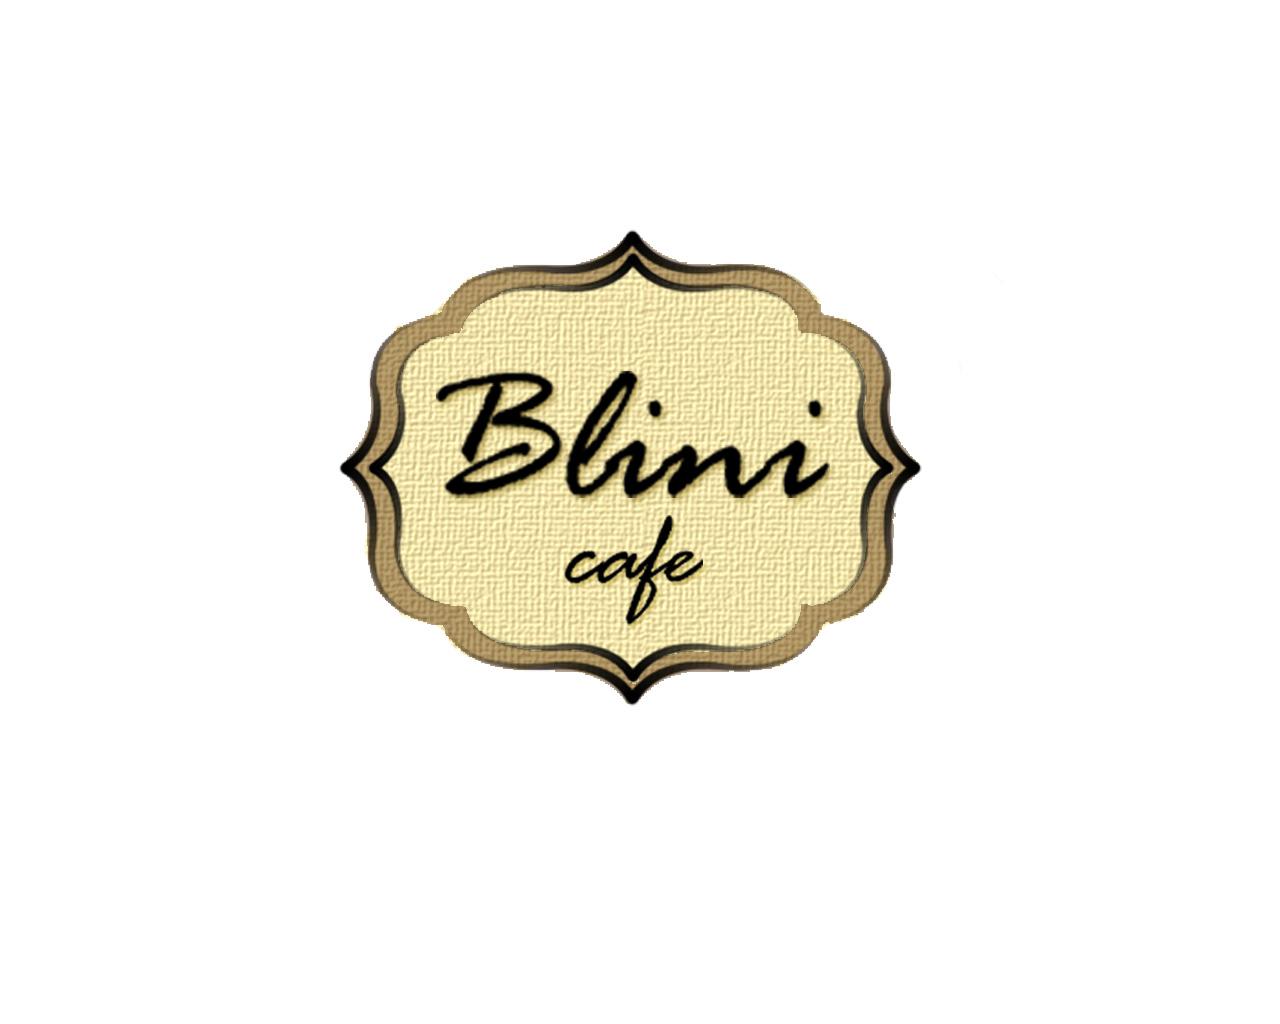 Logo Design by Ioanna Rokka - Entry No. 55 in the Logo Design Contest Creative Logo Design for Blinì.